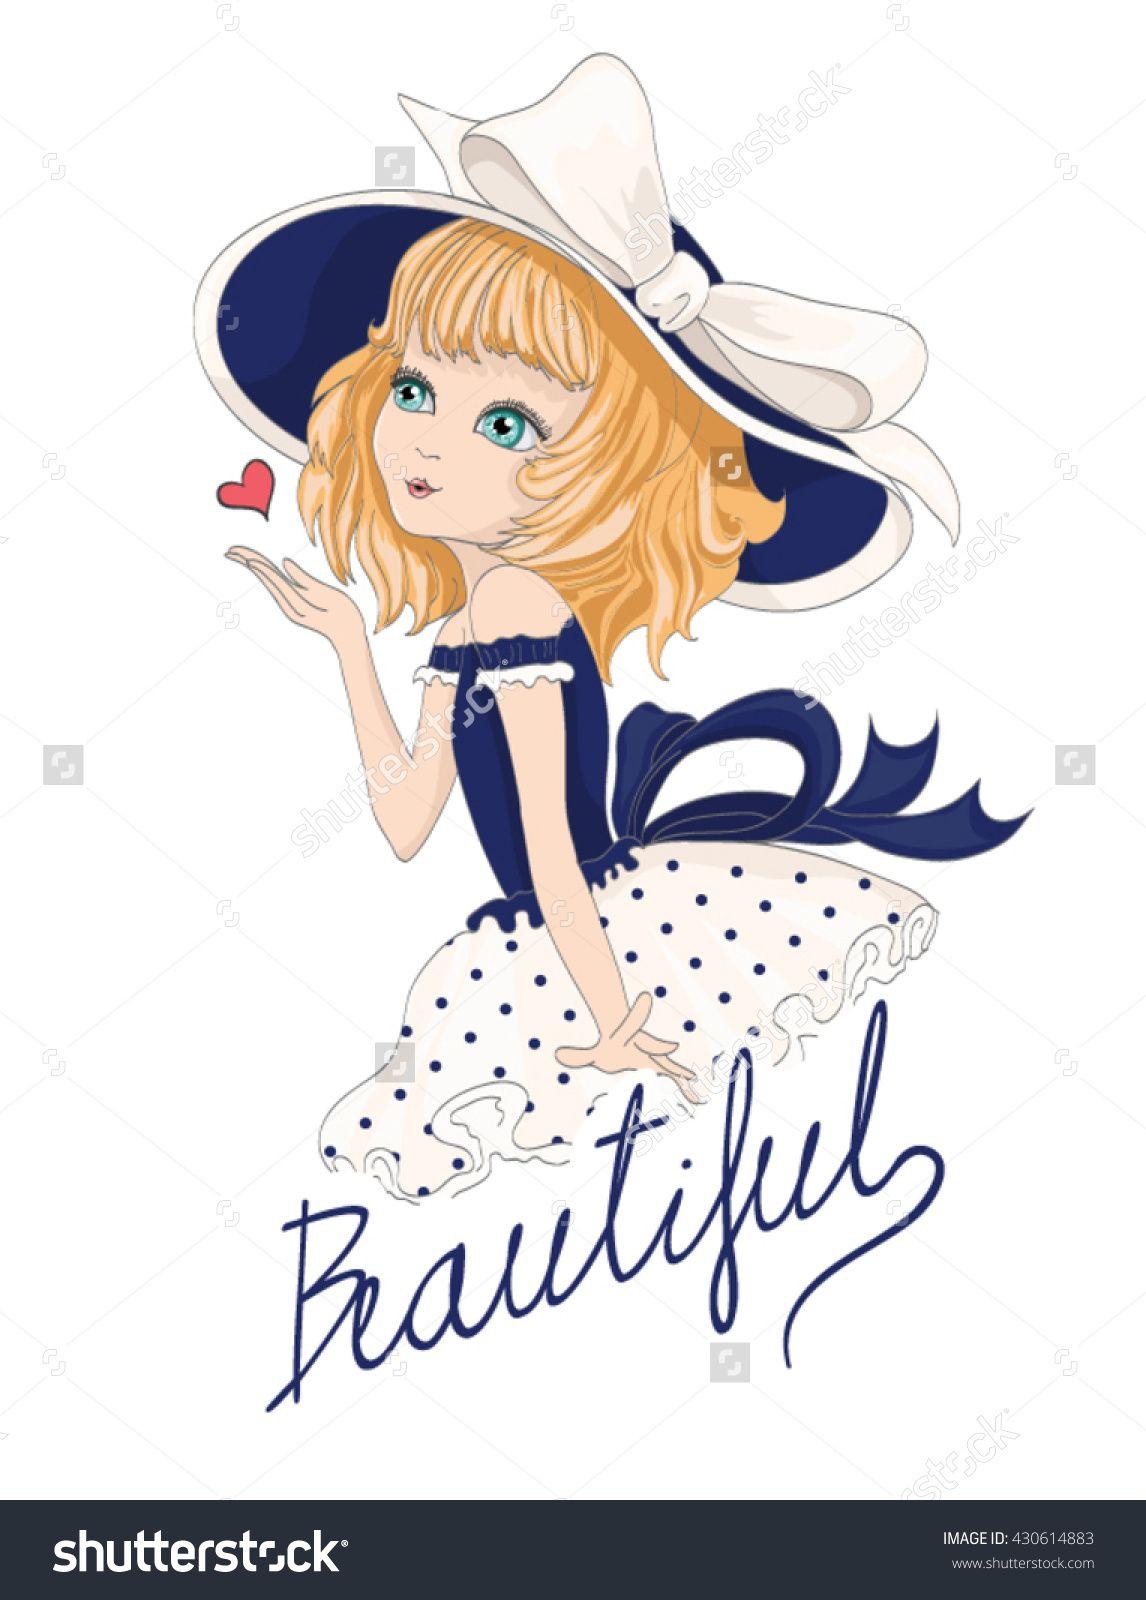 Uncategorized Girl Pictures To Print beautiful romantic girl t shirt print vector cartoon character design